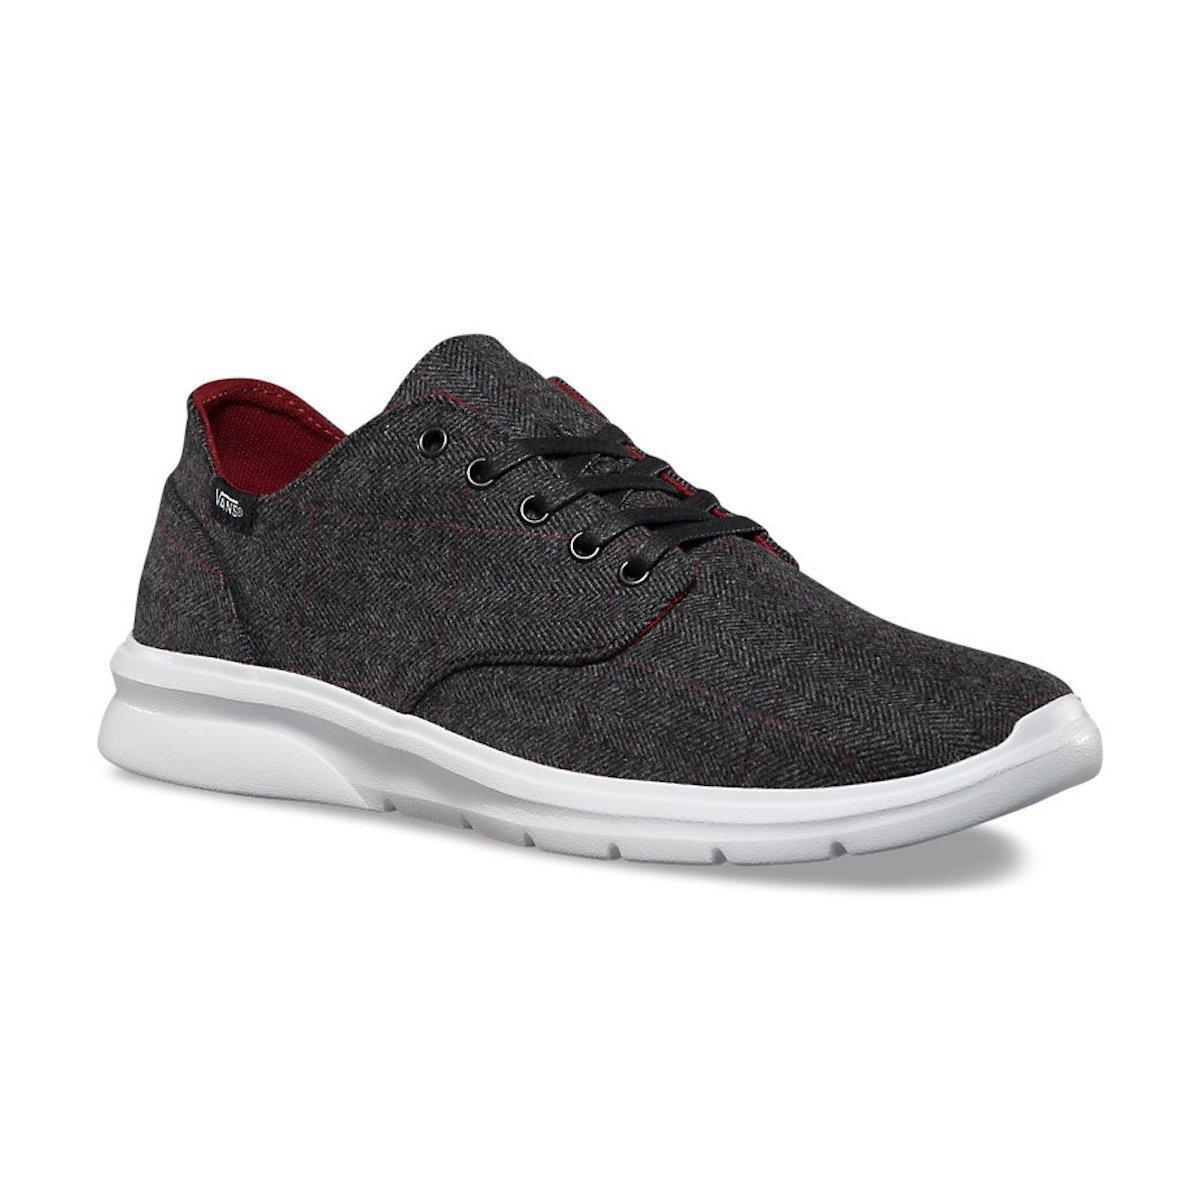 Vans Men's Iso 2 Tweed Casual Shoes 7.5 M US Women / 6 M US Men|Black/White